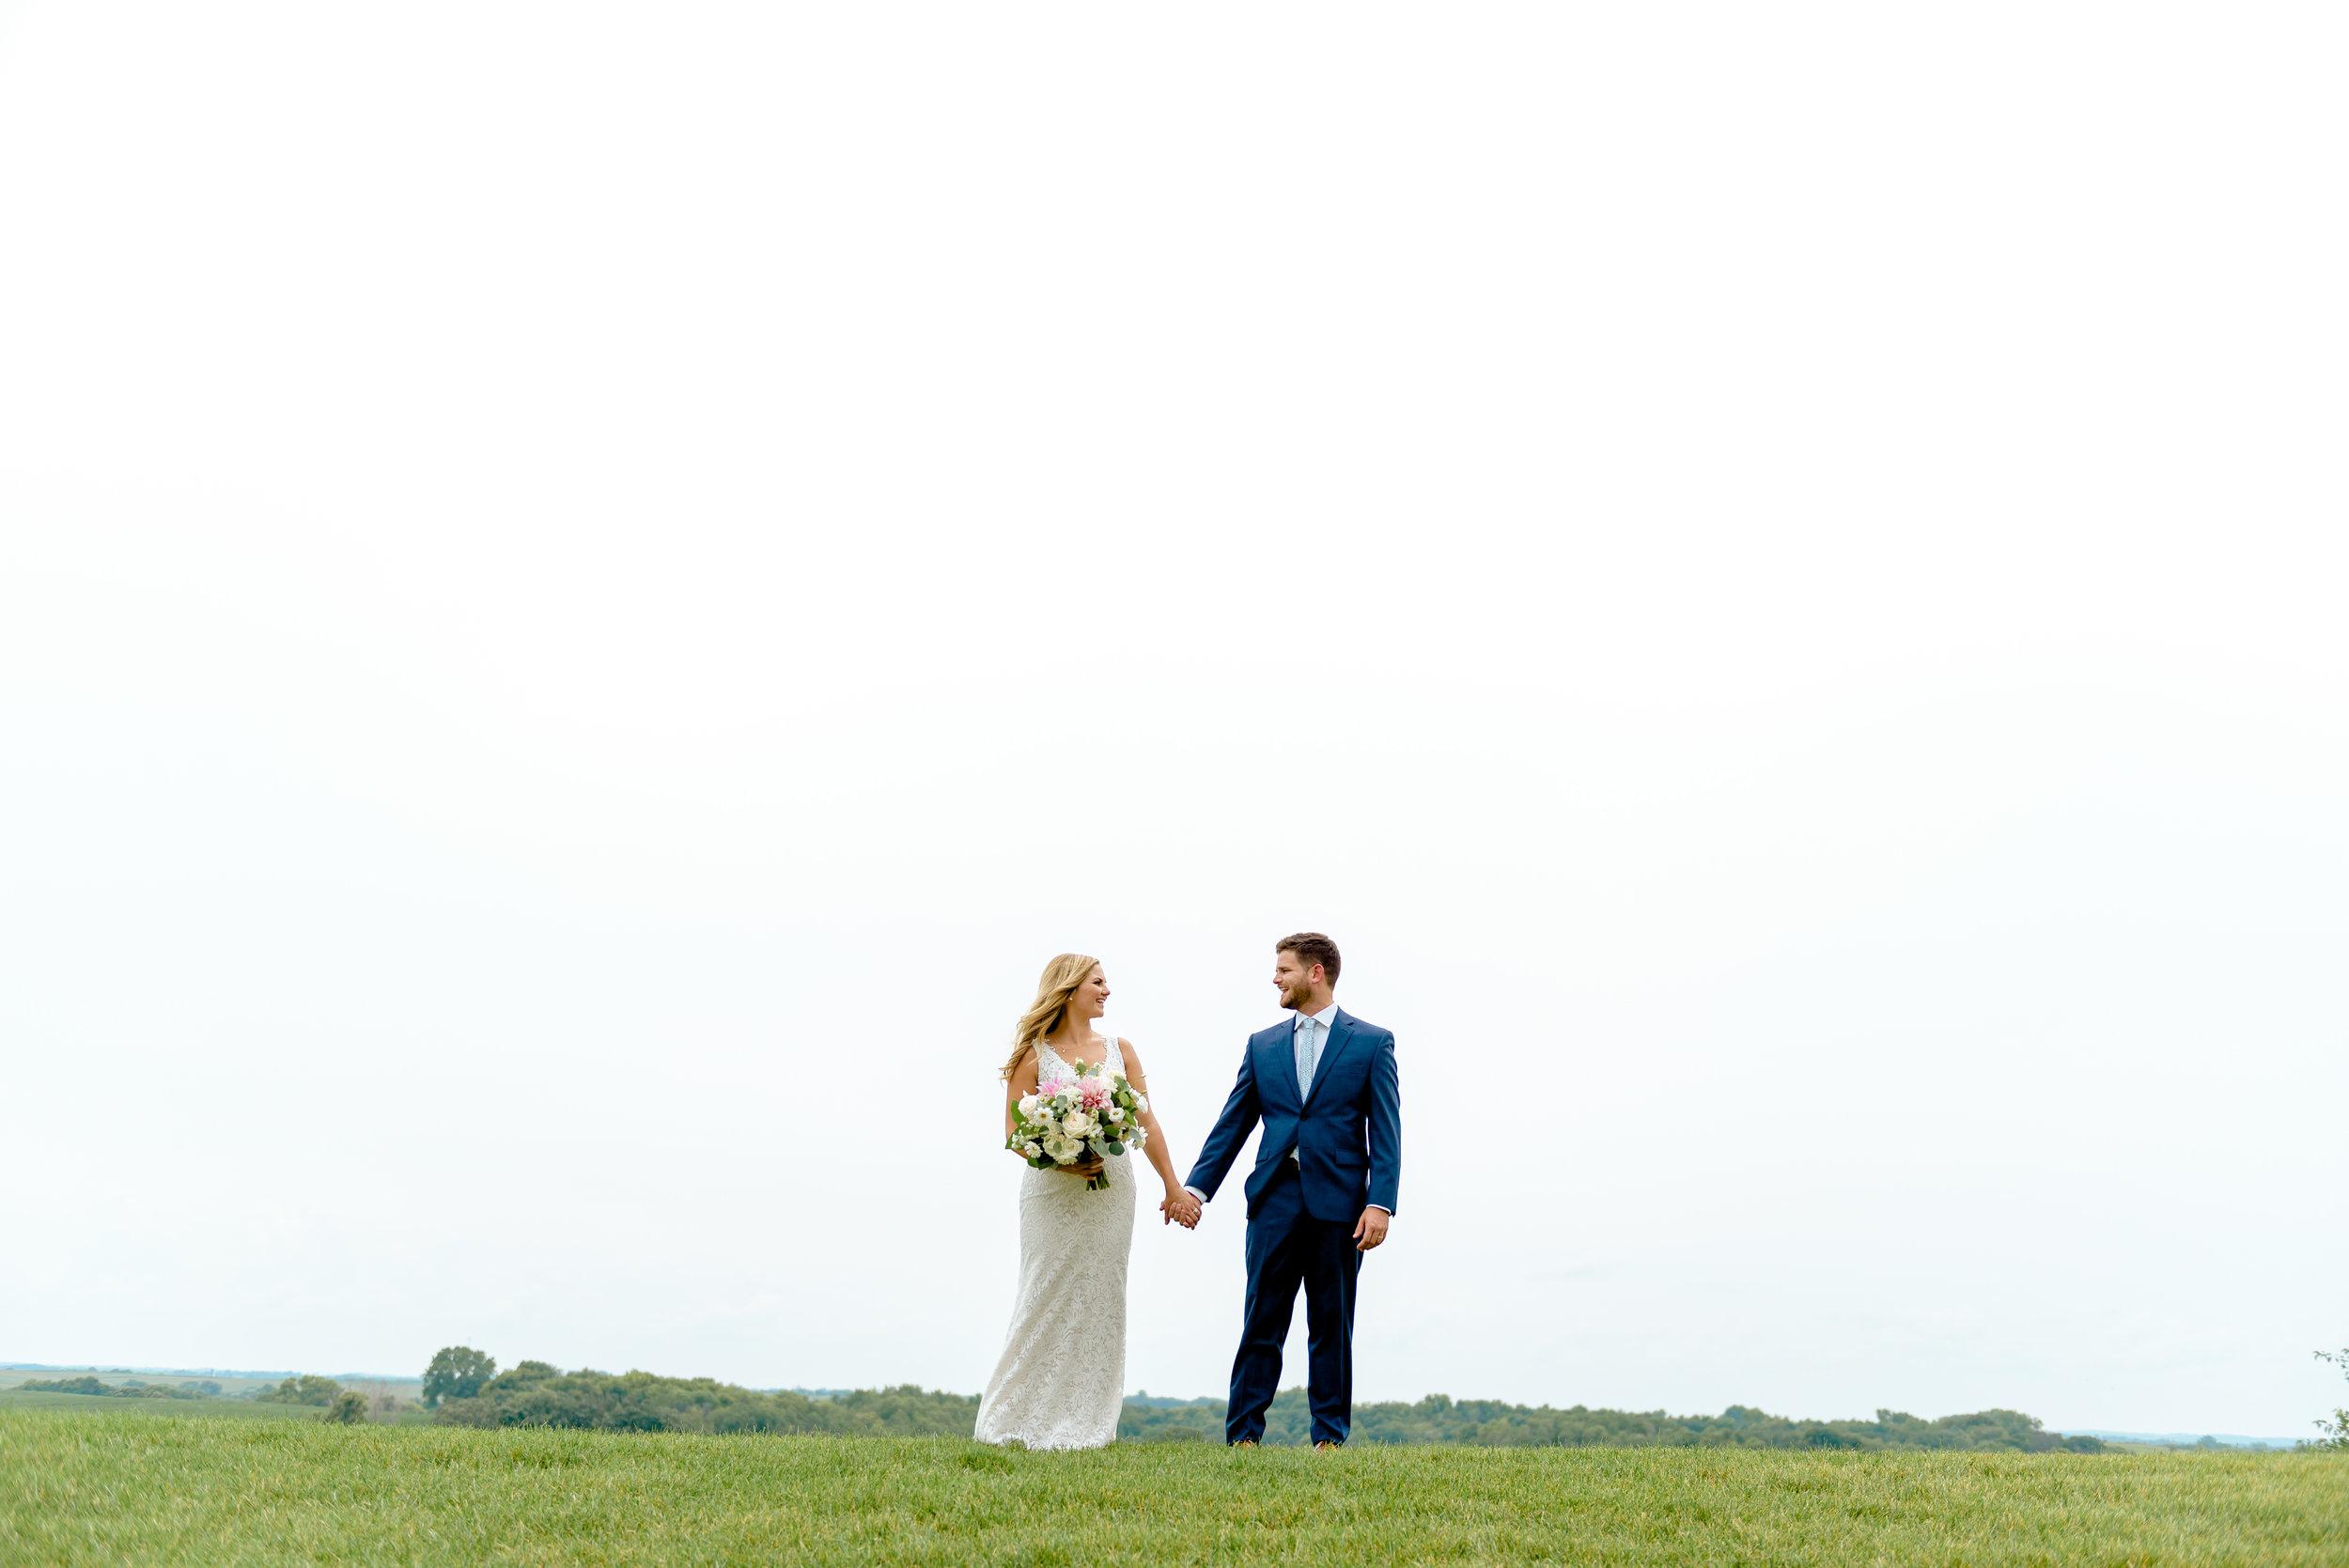 Legacy Hill Farm Wedding Photos on Hilltop - MN Best Wedding Photographer